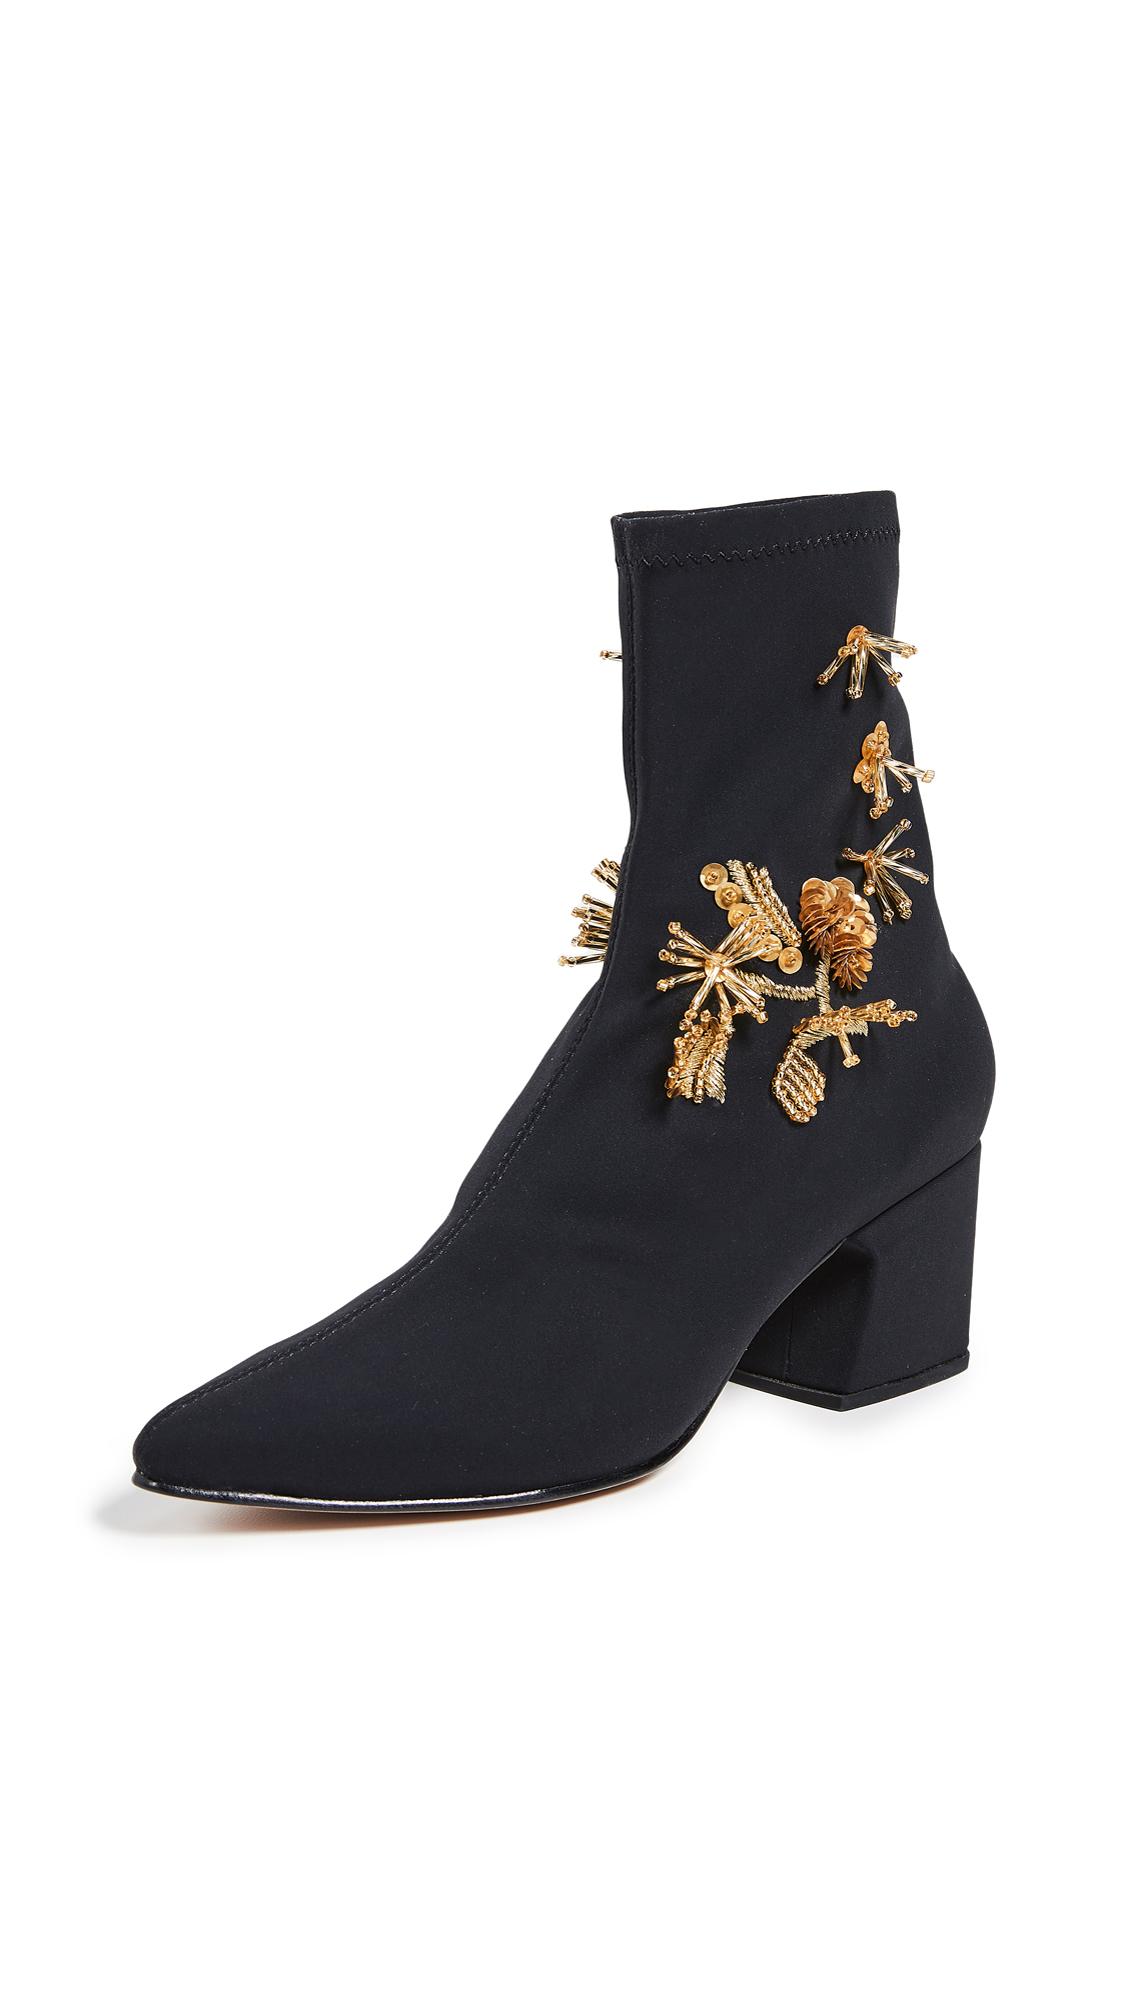 Rachel Comey Zaha Ankle Boots - Black/Gold